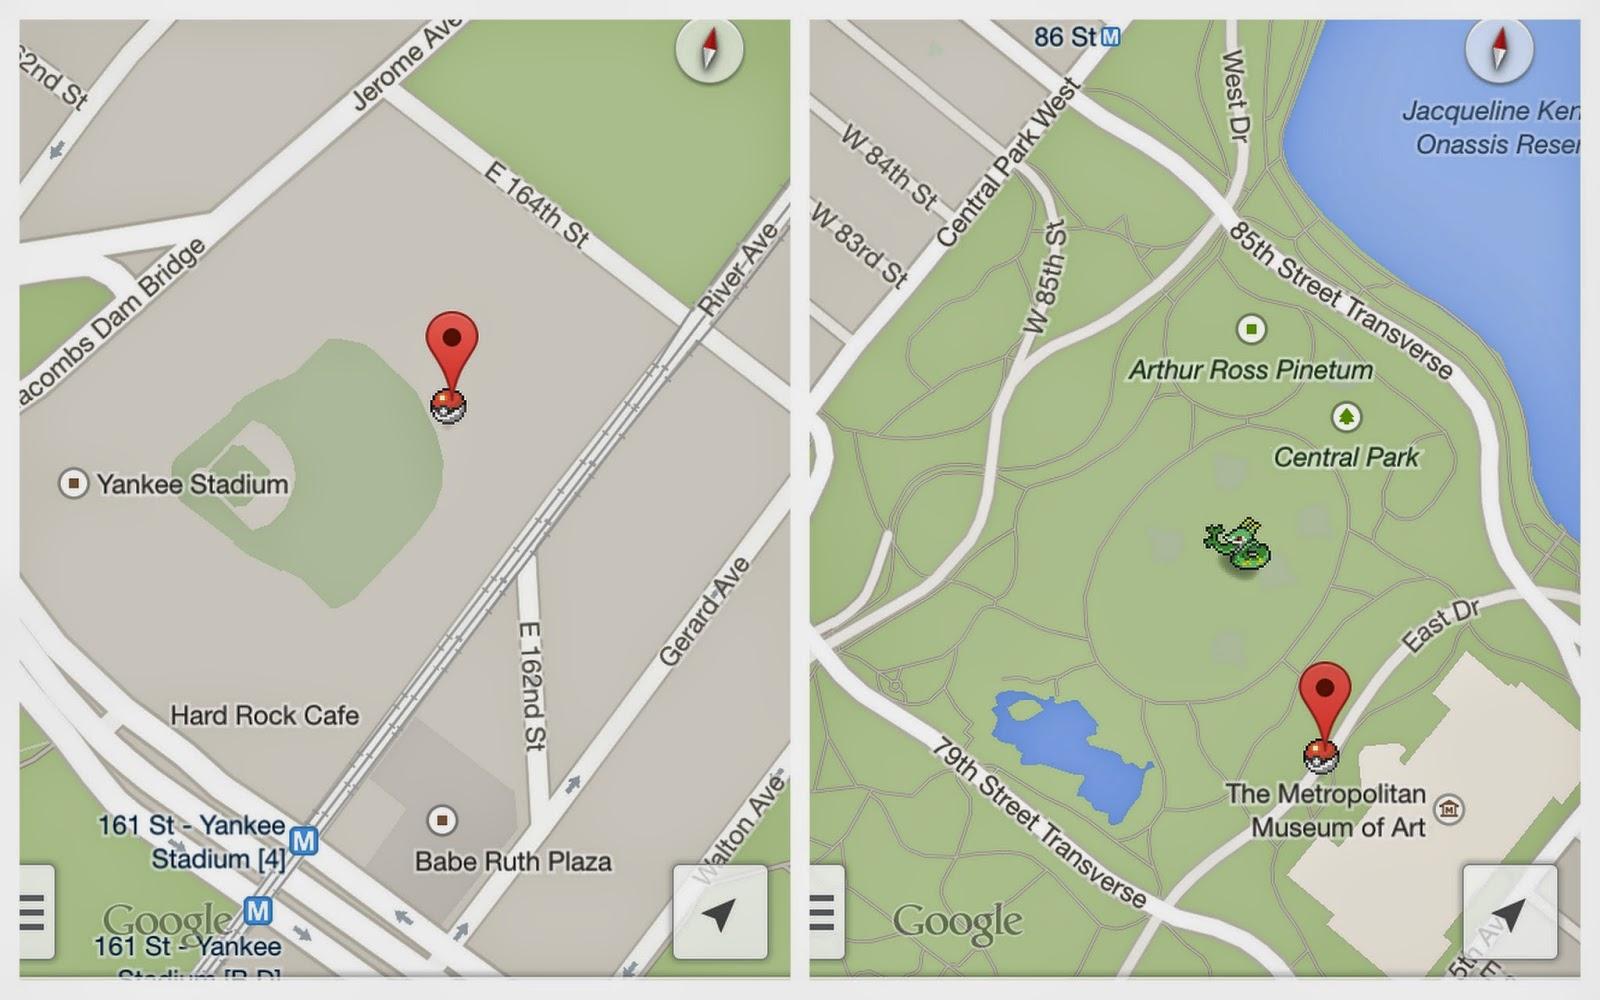 Pokémon Google Maps Aprilscherz 1.April 2014 lustig Online Gadgets Blog Flussperle Pokedex